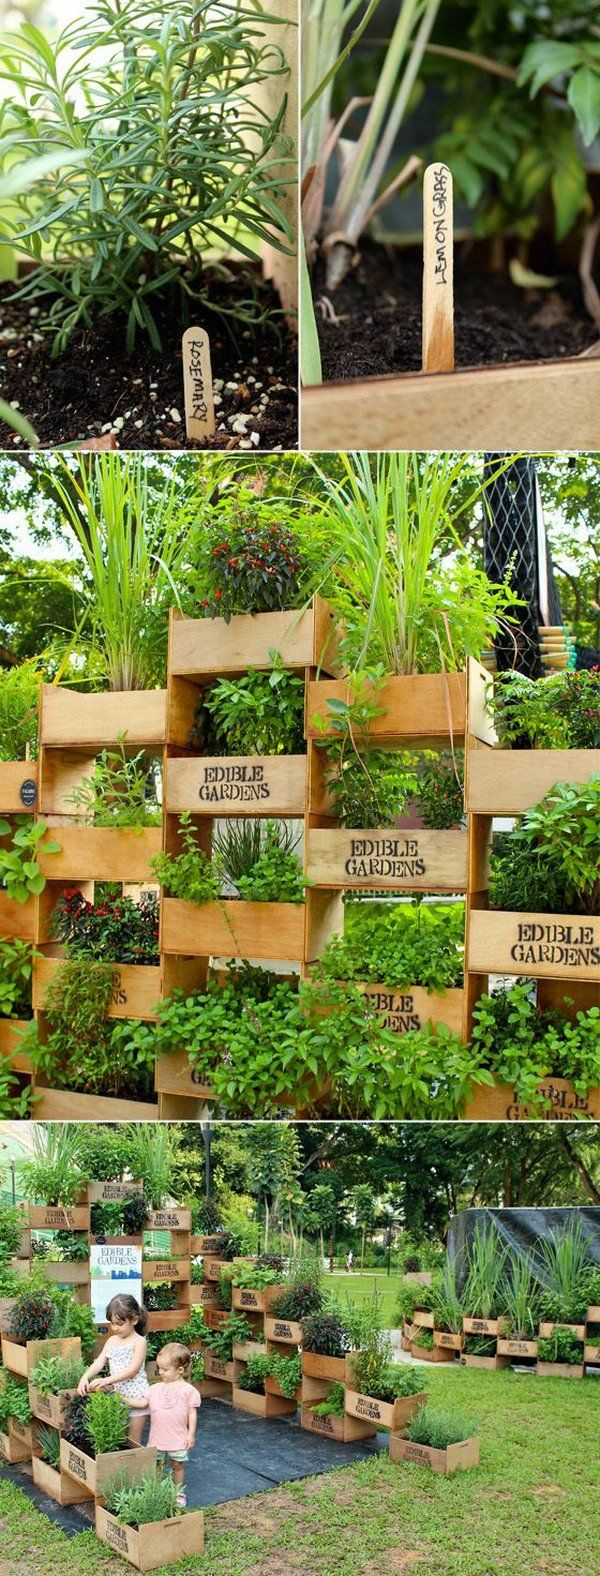 20 Cool Vertical Gardening Ideas Jardinage Idees De Jardinage